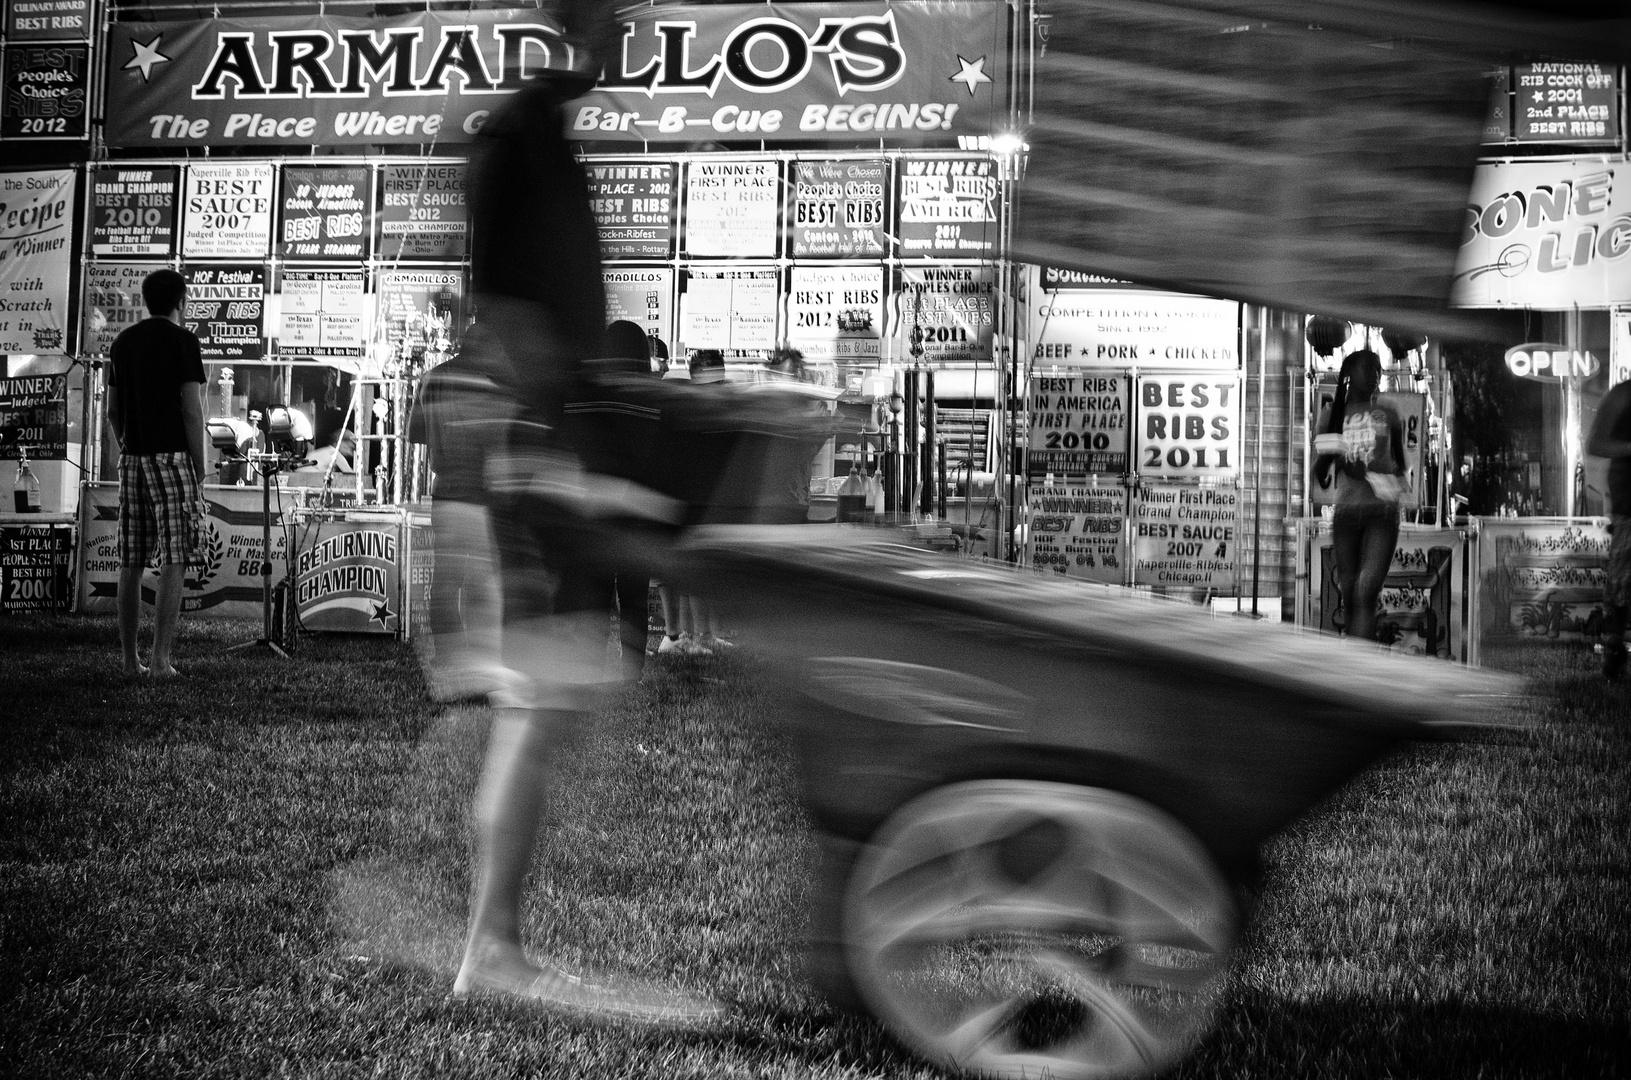 Armadillo's Bar -B-Cue  Begins 1